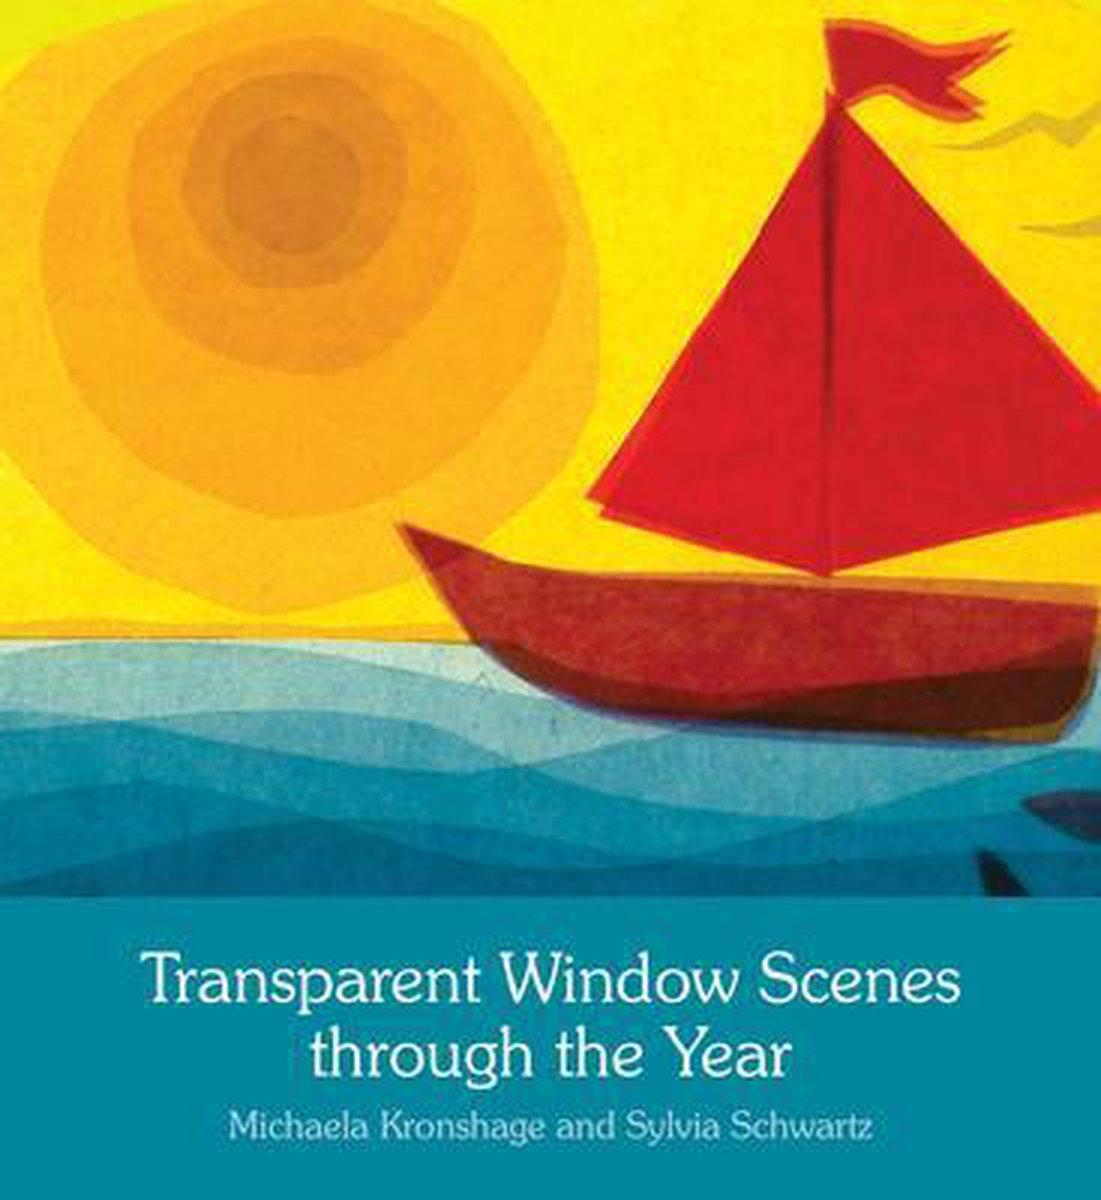 Transparent Window Scenes Through the Year - Michaela Kronshage